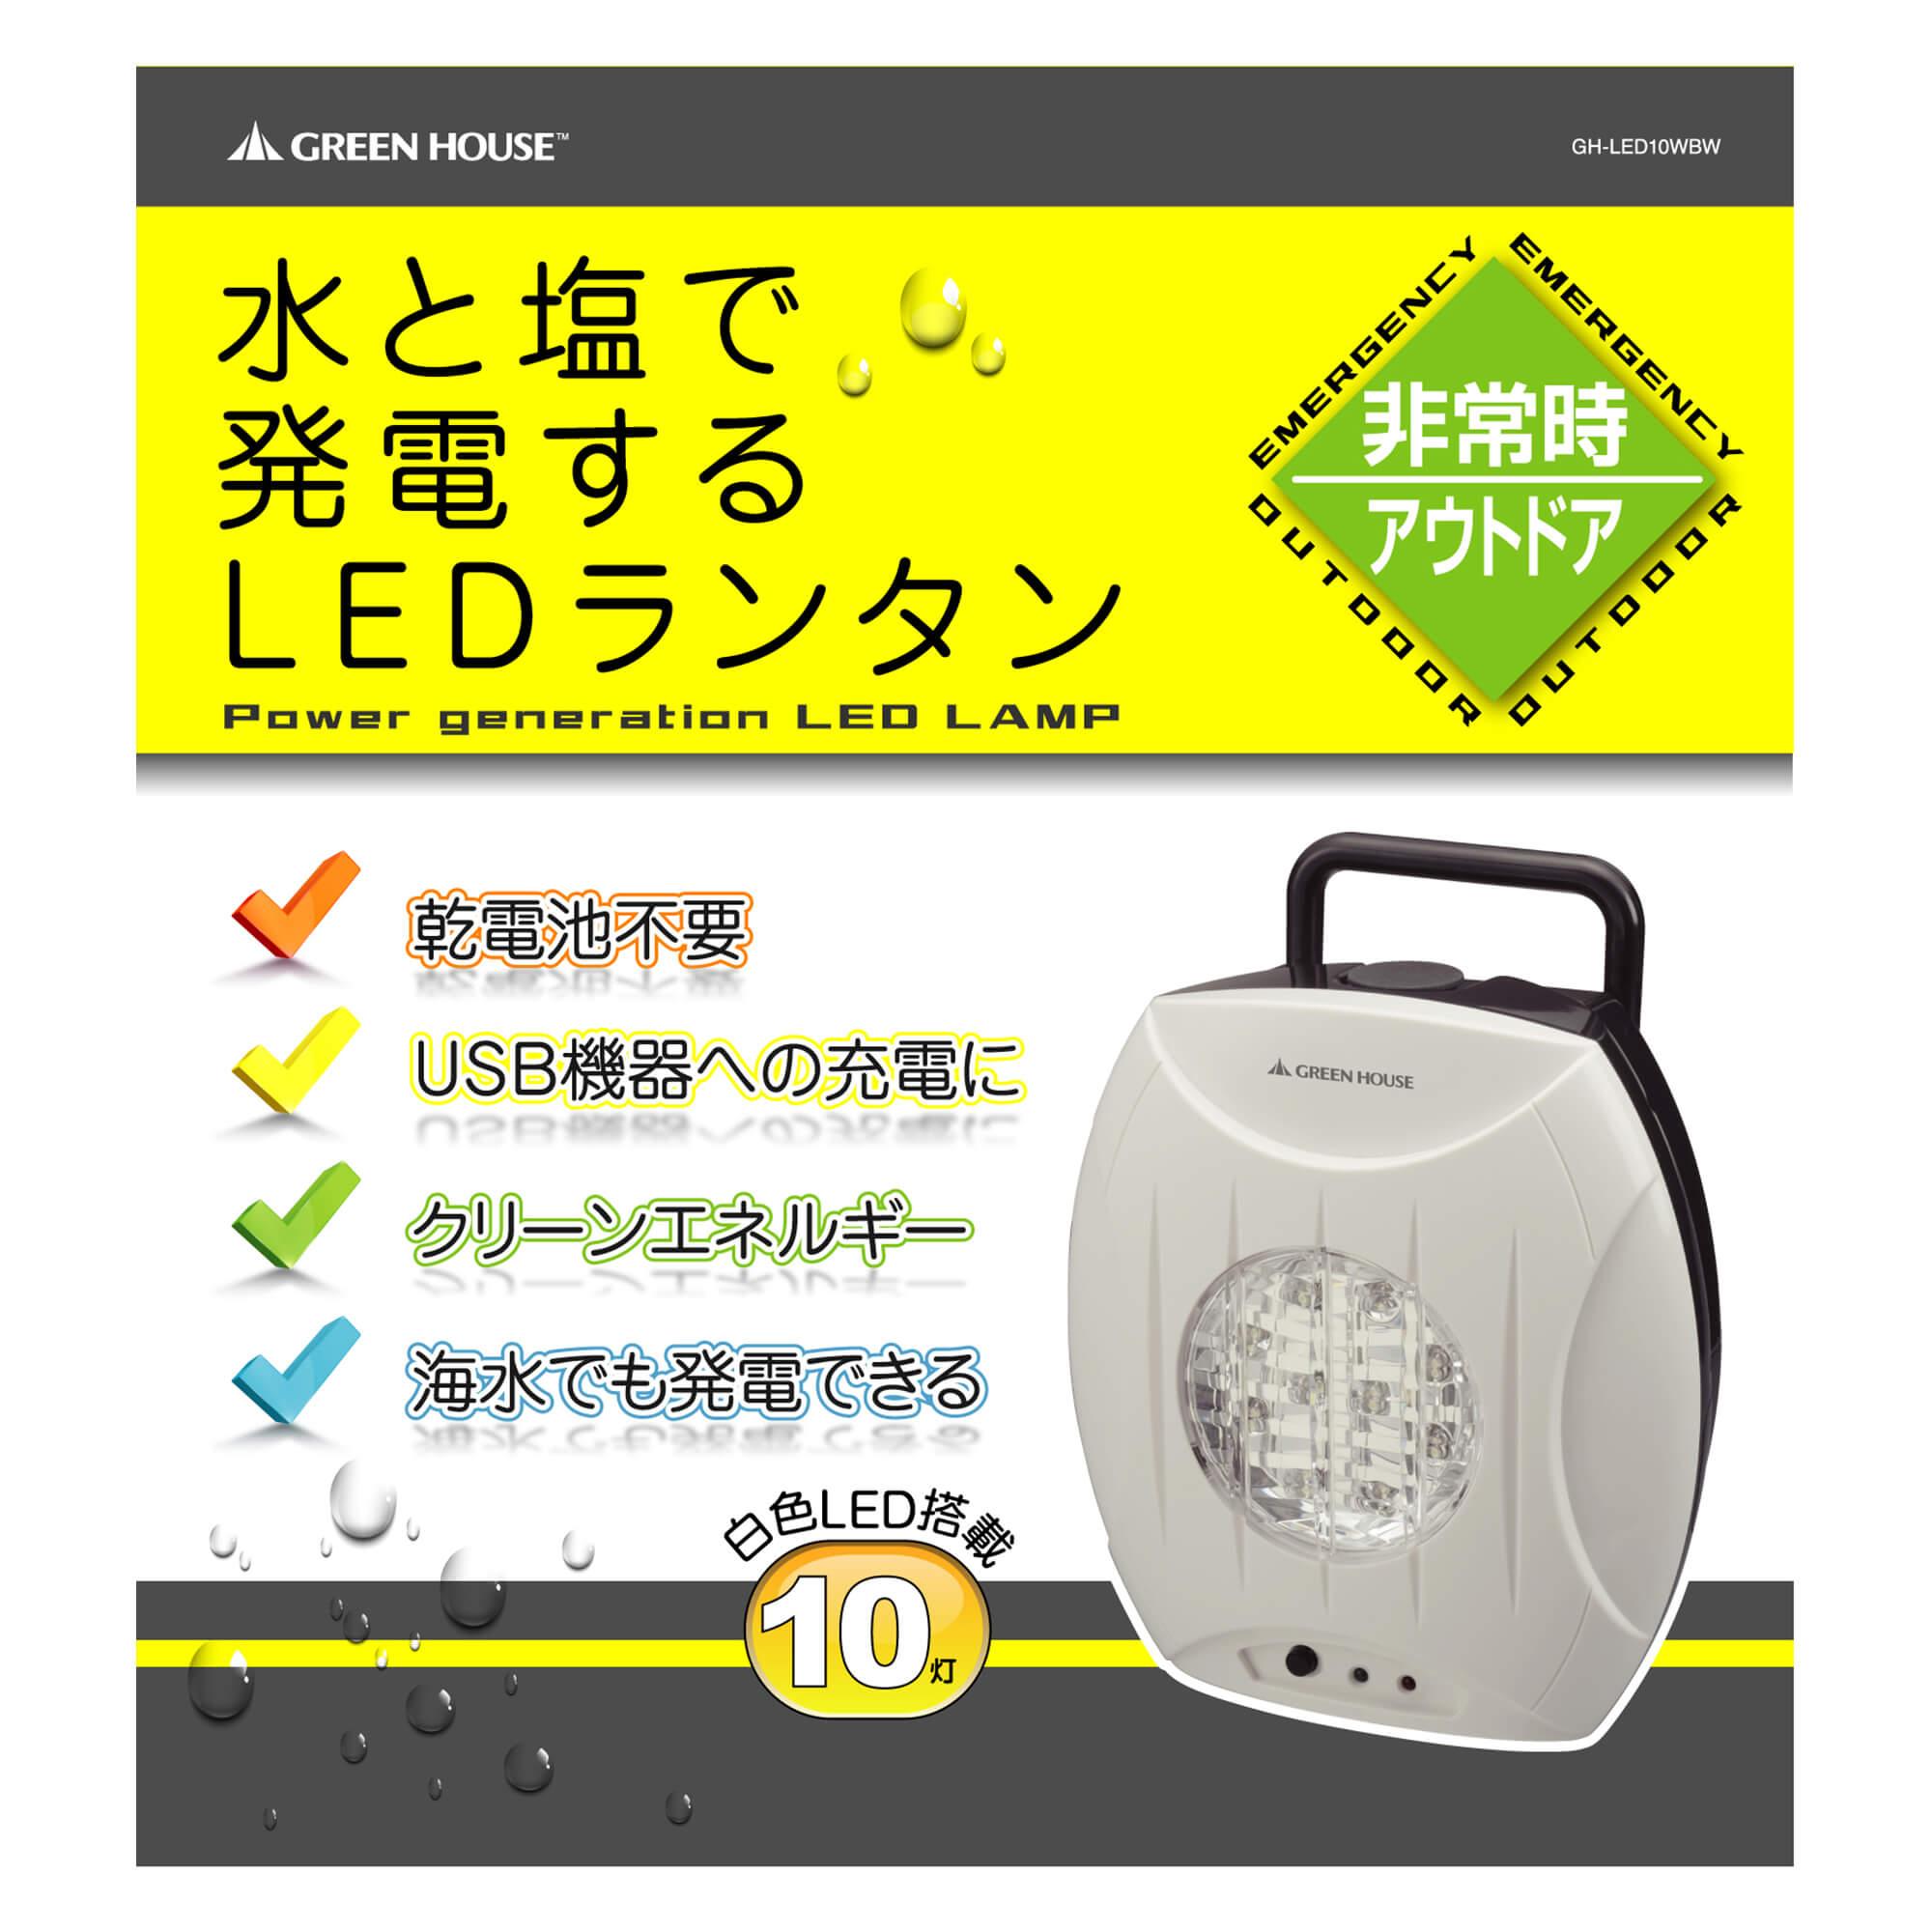 GH-LED10WBW